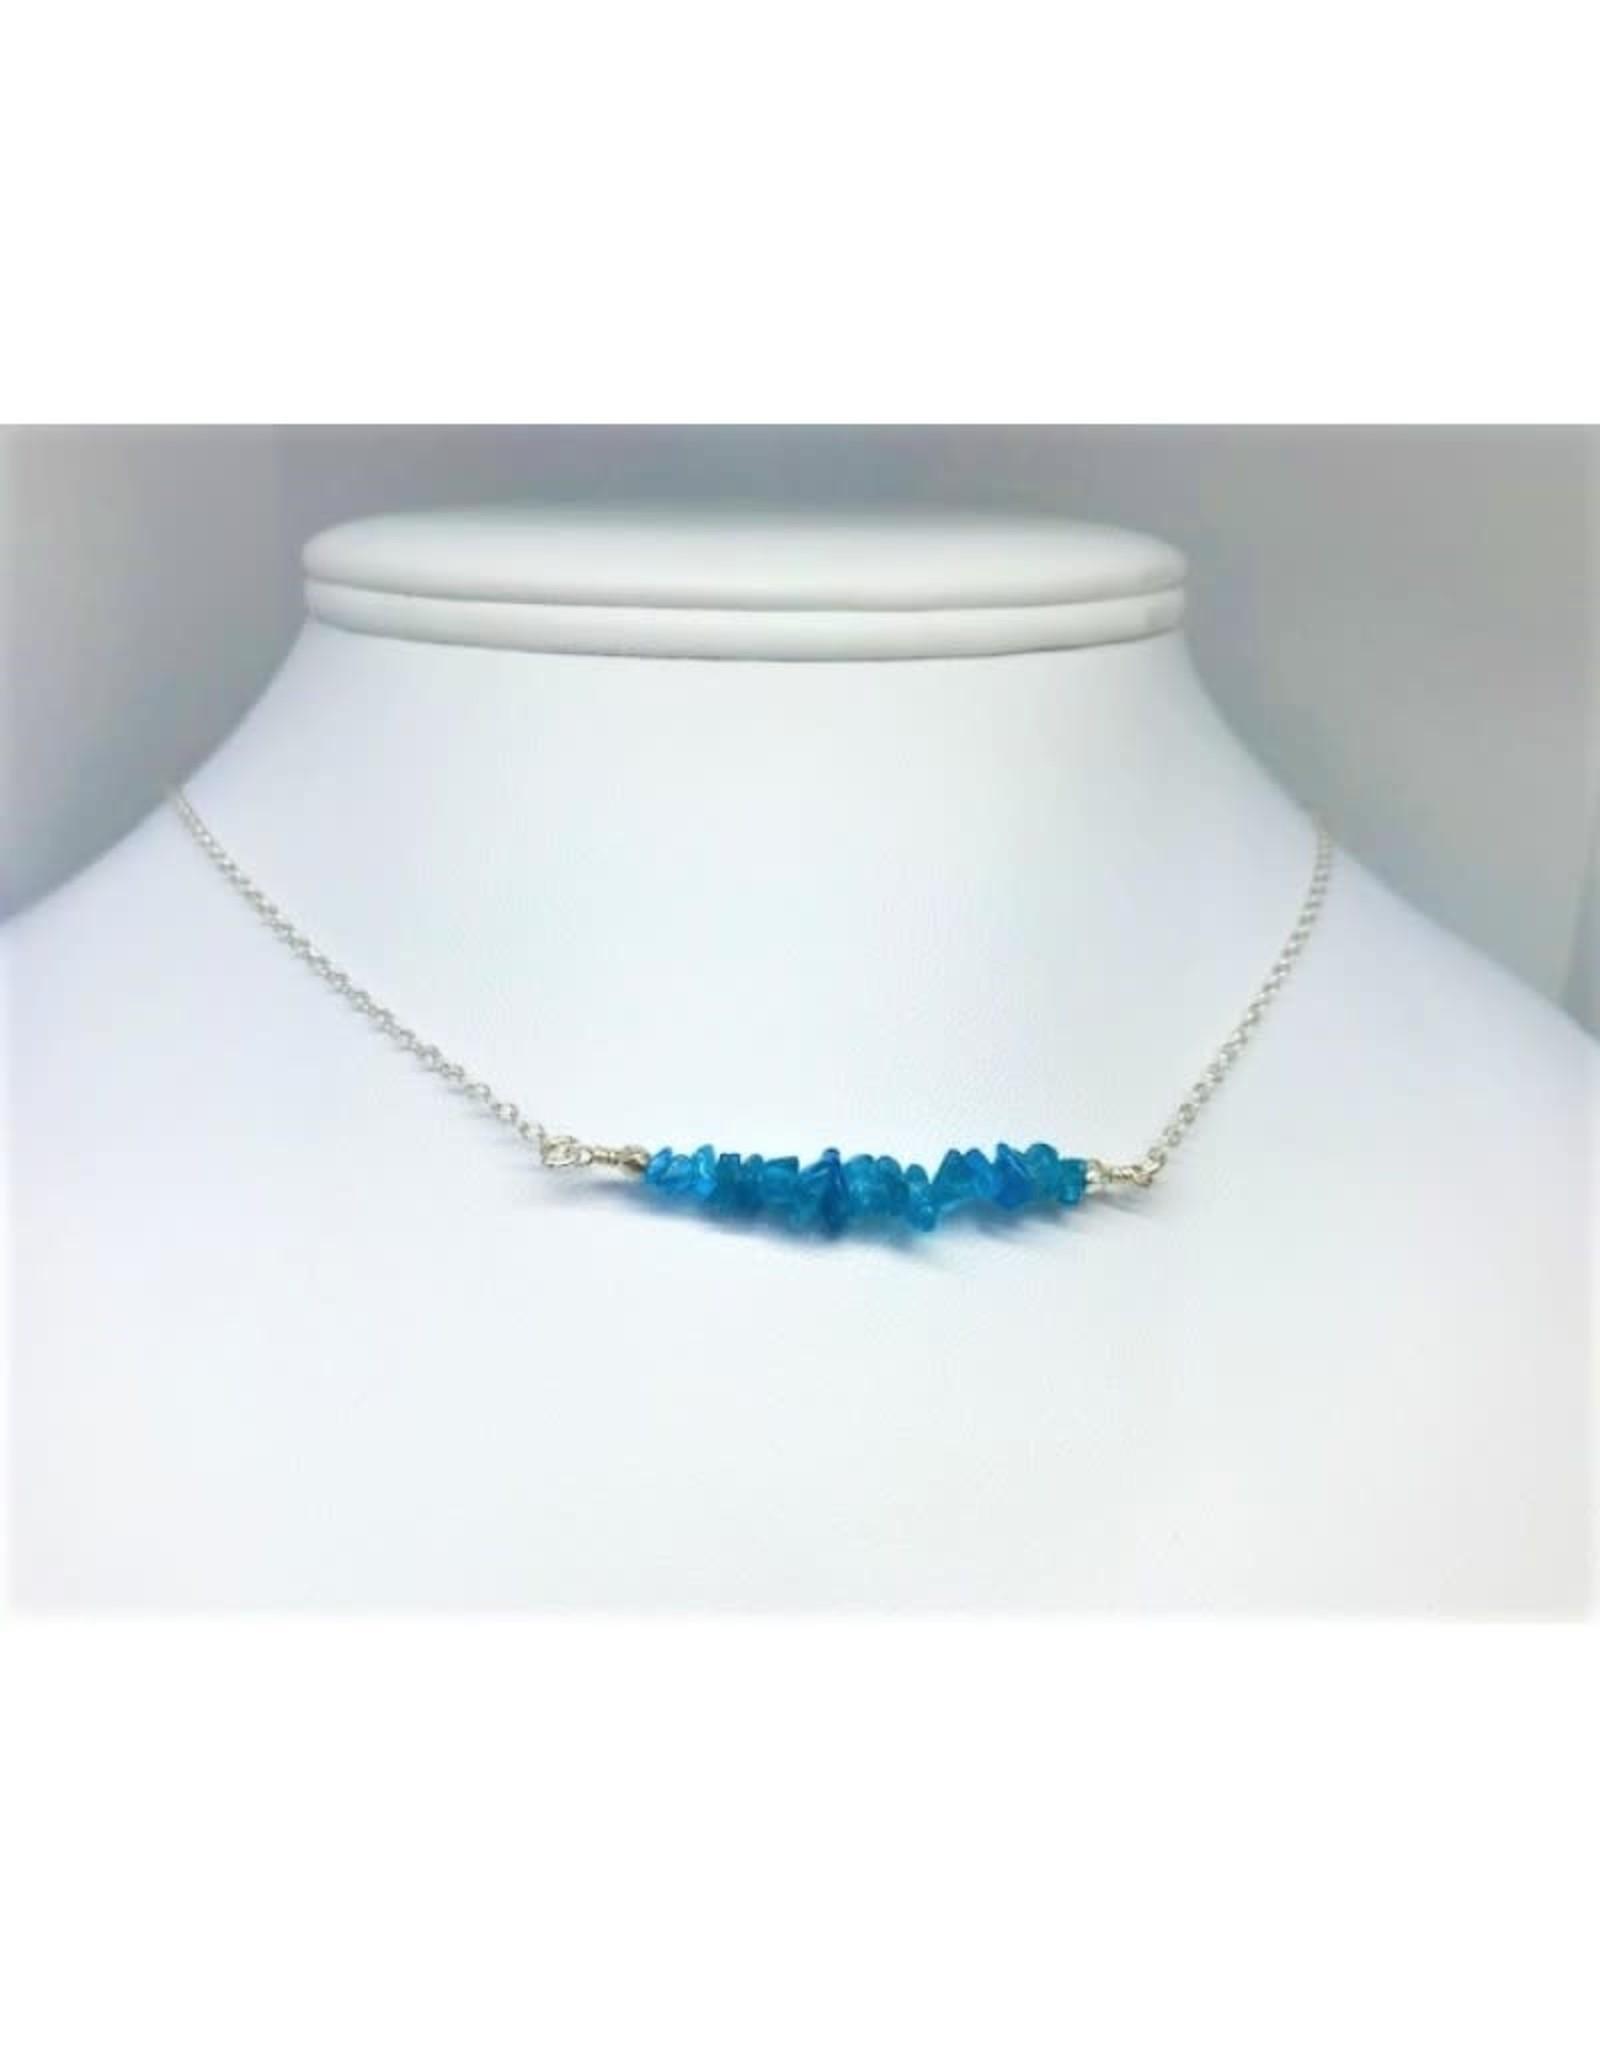 Gemstone Bar Necklace - Apatite